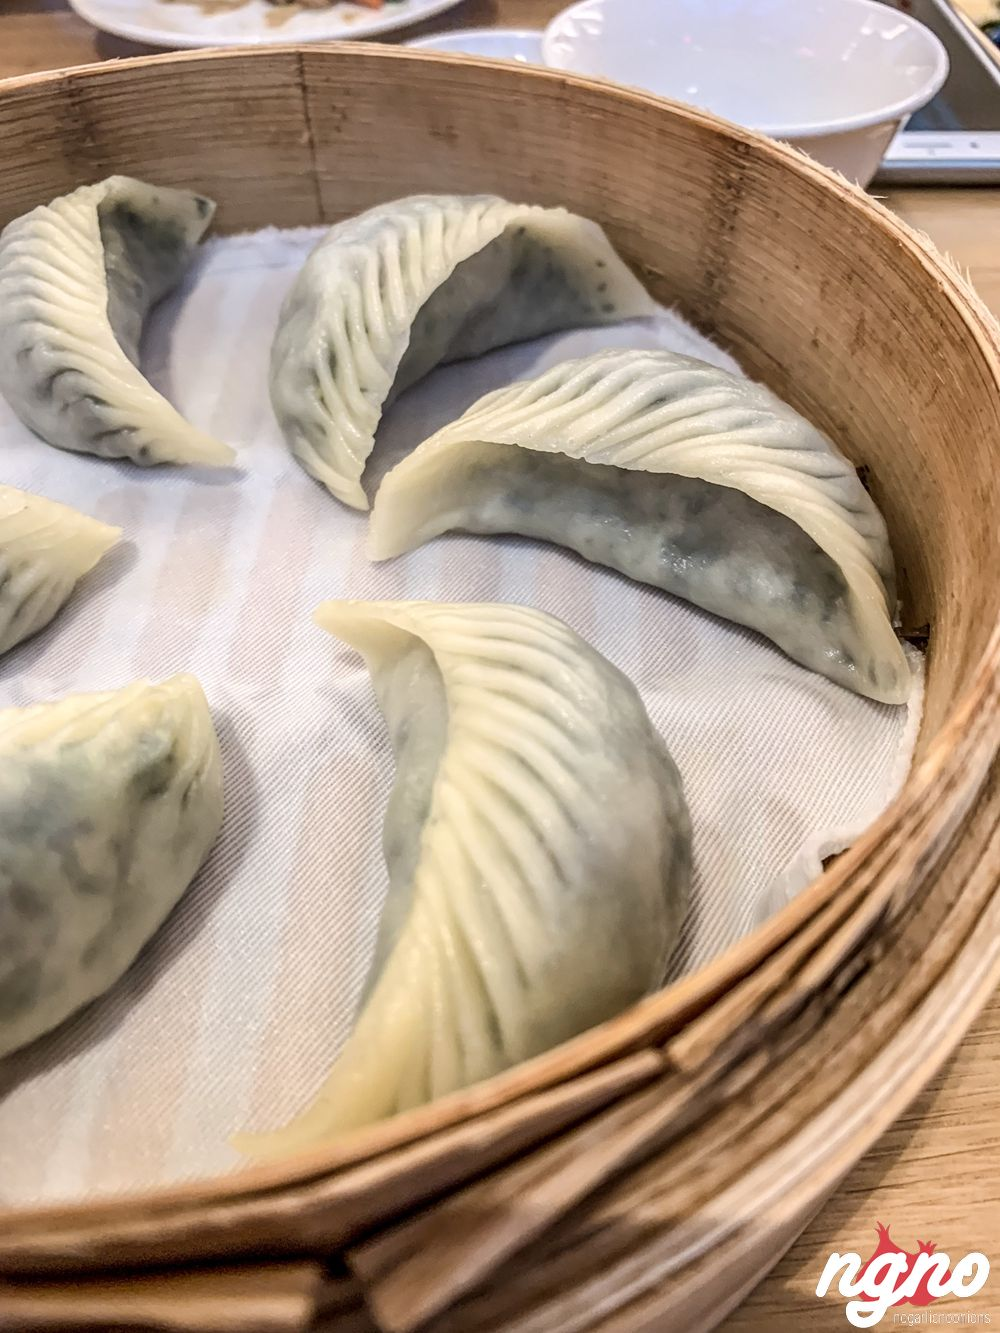 din-tai-fung-dubai-food-nogarlicnoonions-102018-11-23-07-01-12